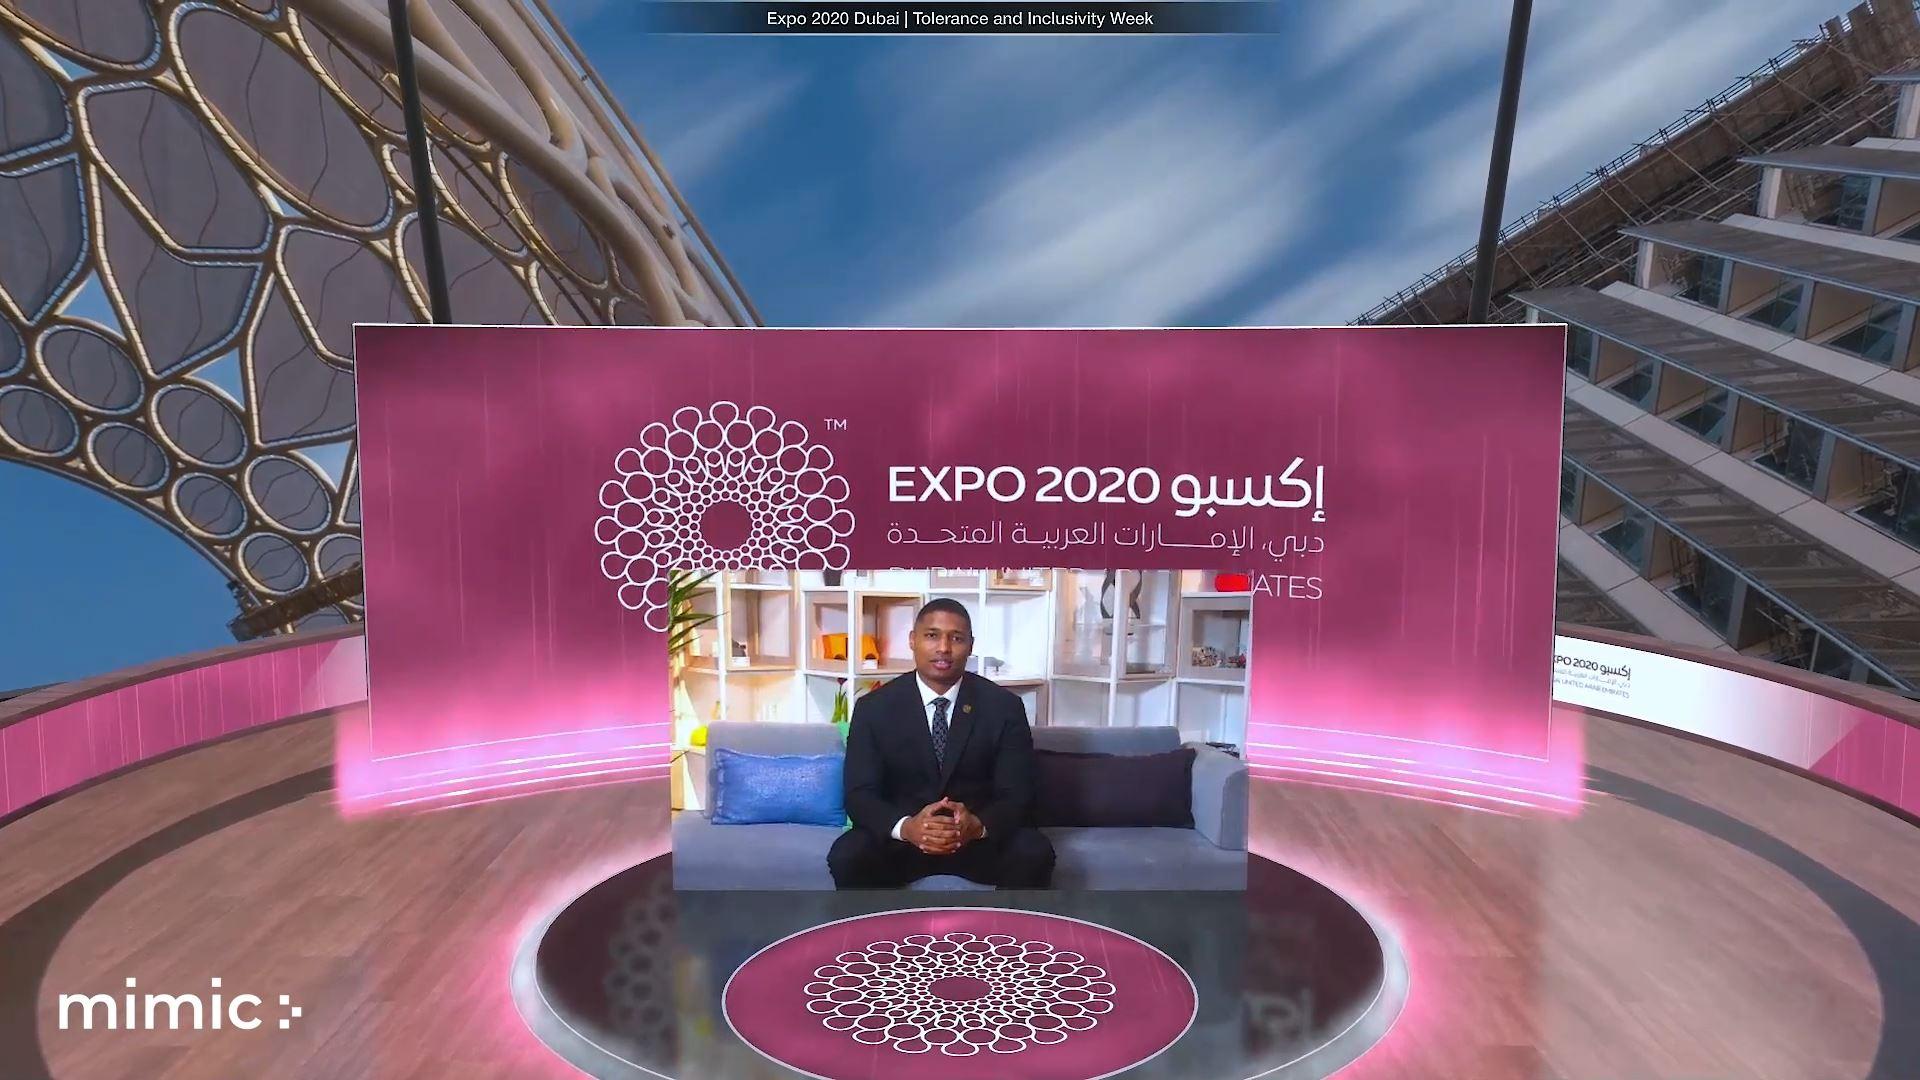 Expo 2020 tolerance and inclusivity Virtual event dual screen